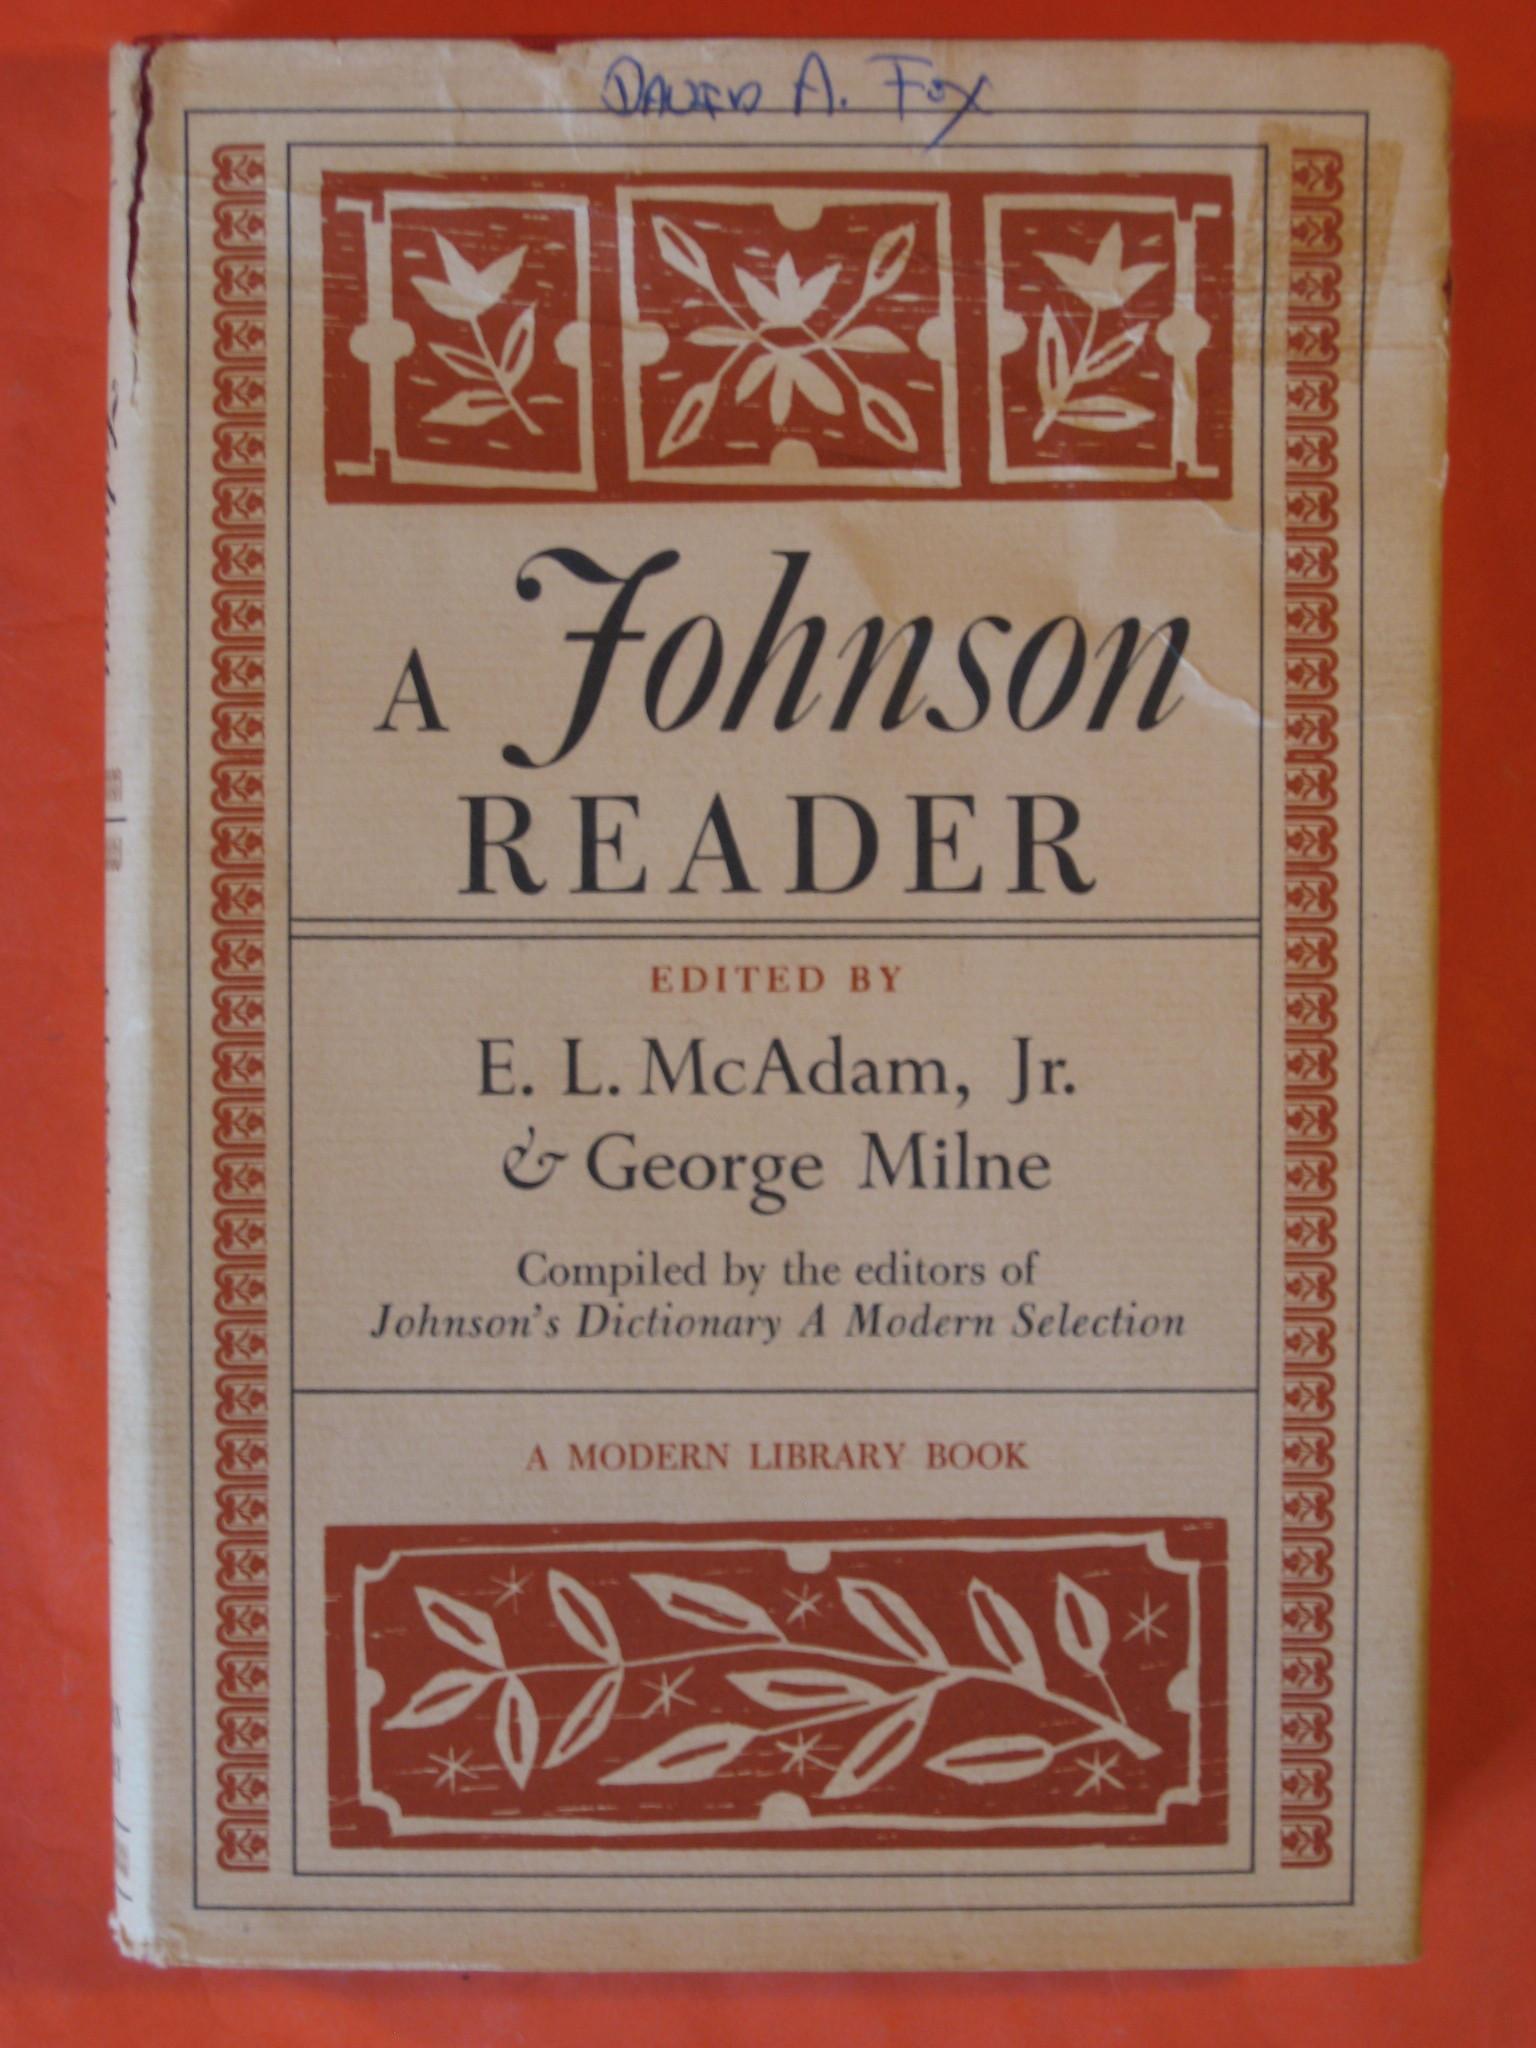 A Johnson Reader, Johnson, Samuel; E.L. McAdam, Jr. ; Milne, George